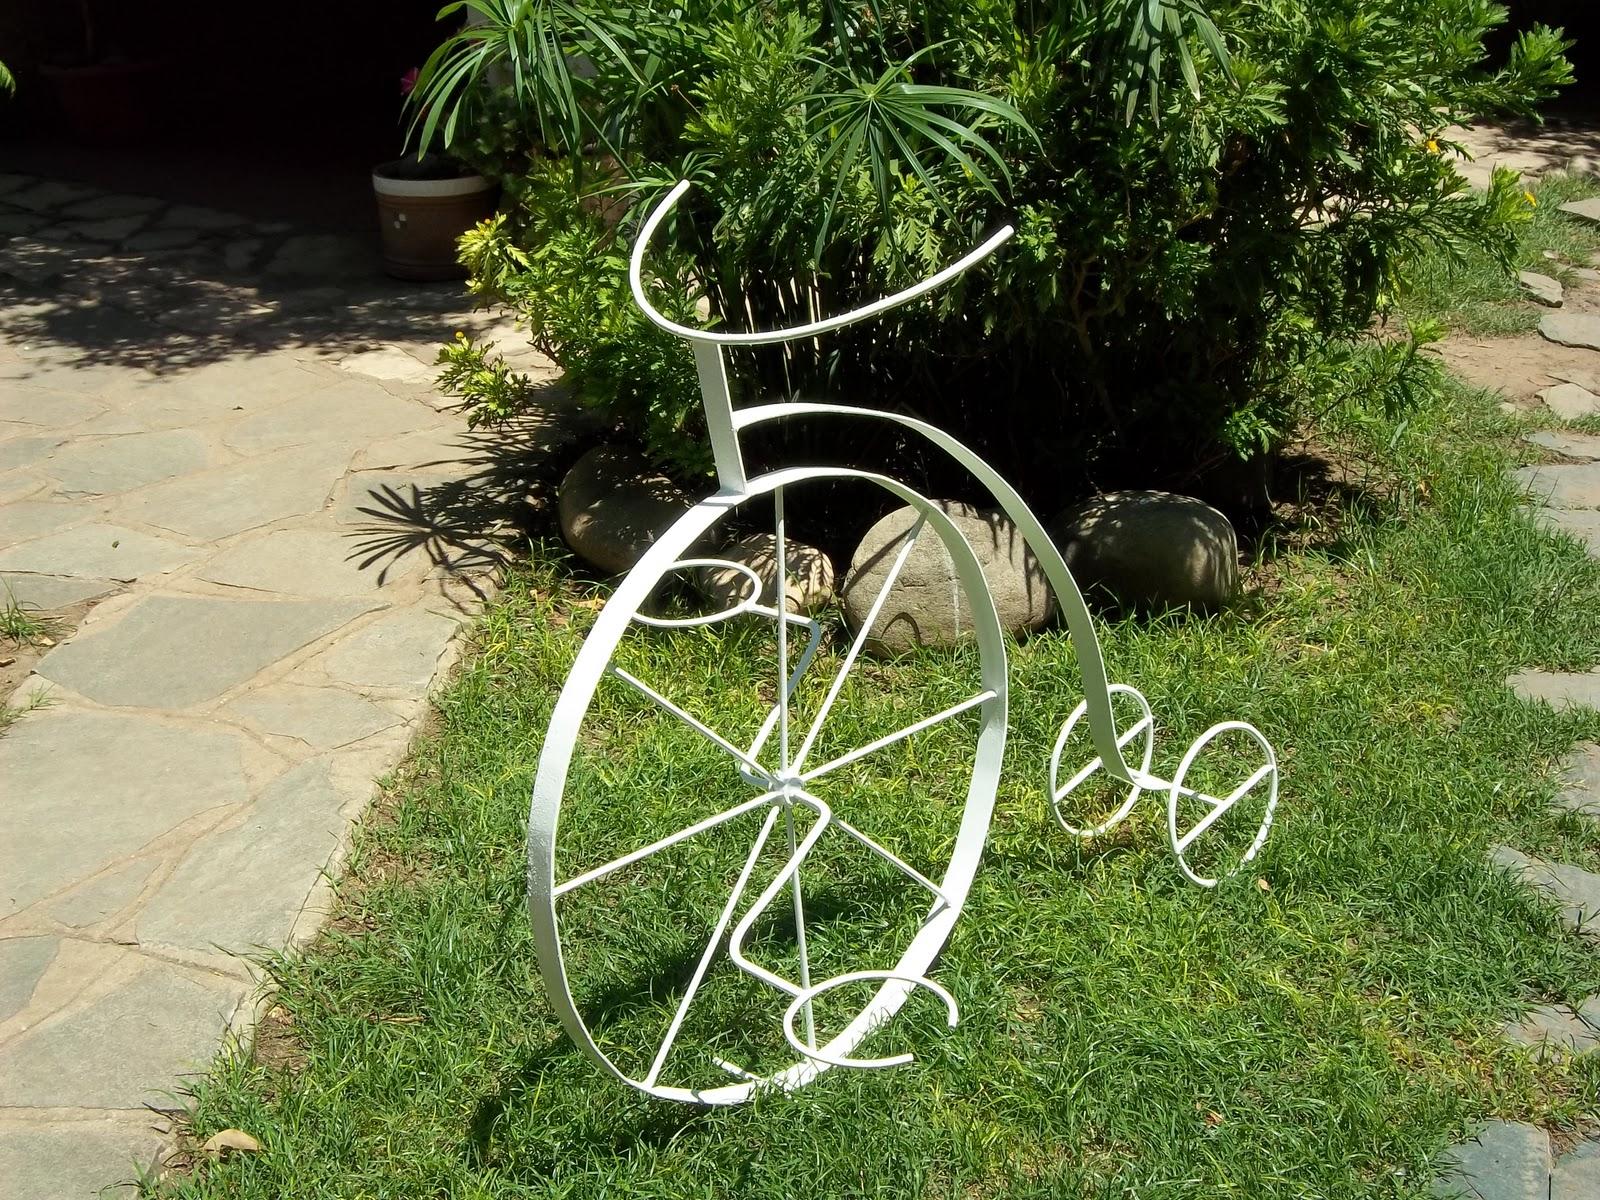 Herreria artistica articulos de jardin for Articulos jardin